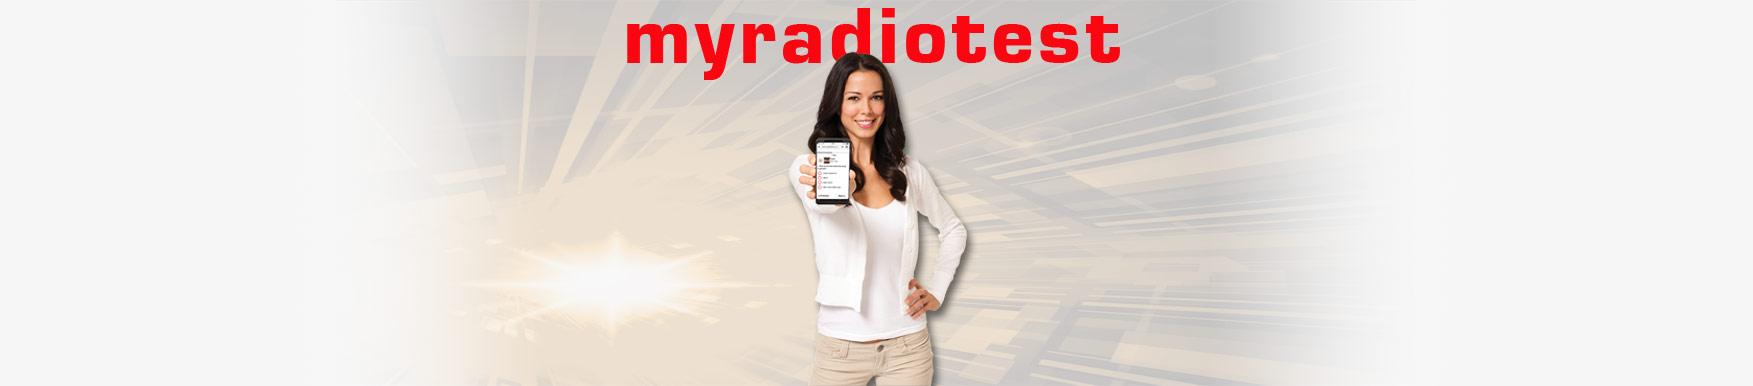 myradiotest-web-banner